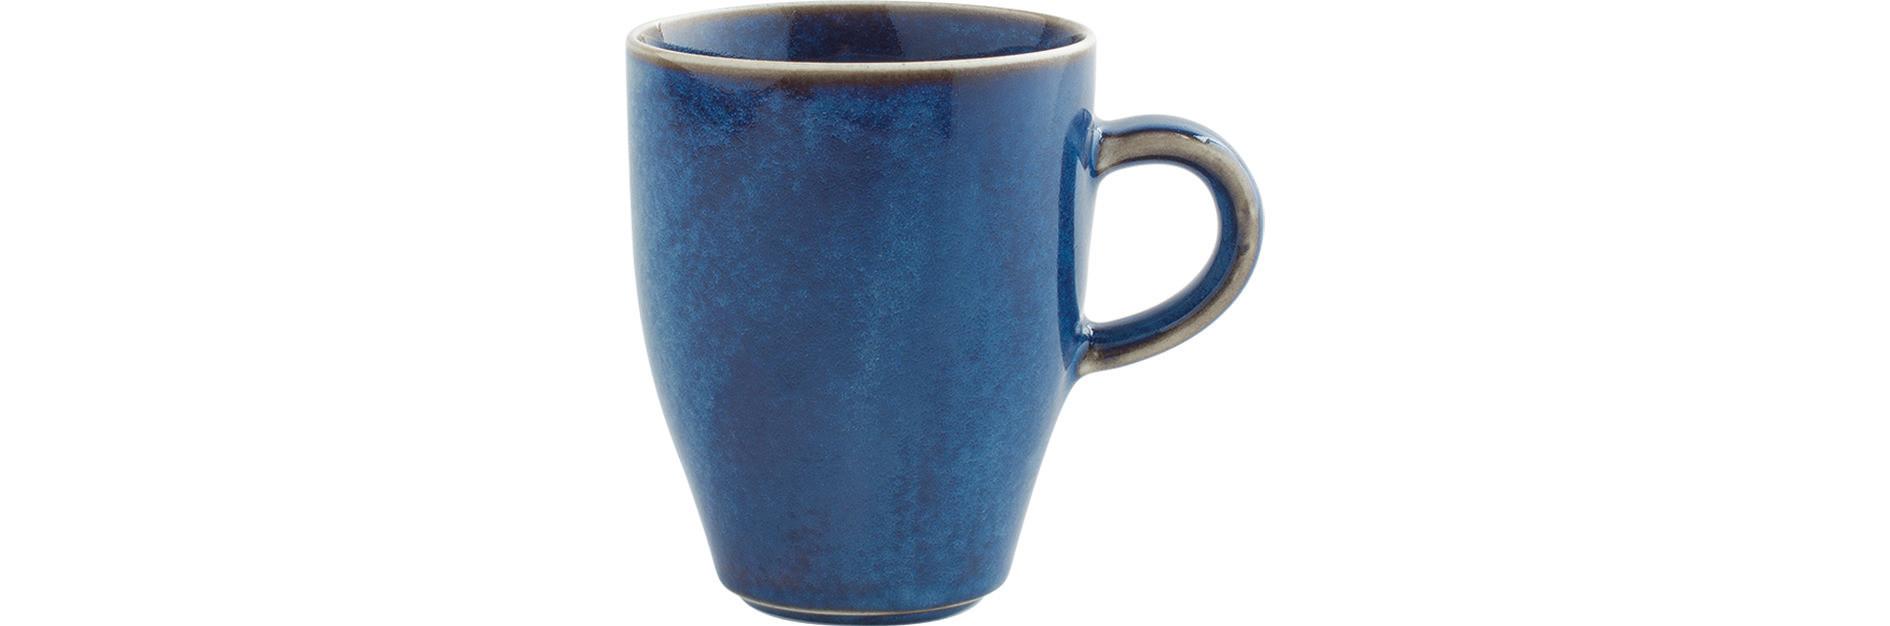 Homestyle, Kaffeebecher ø 85 mm / 0,32 l atlantic blue